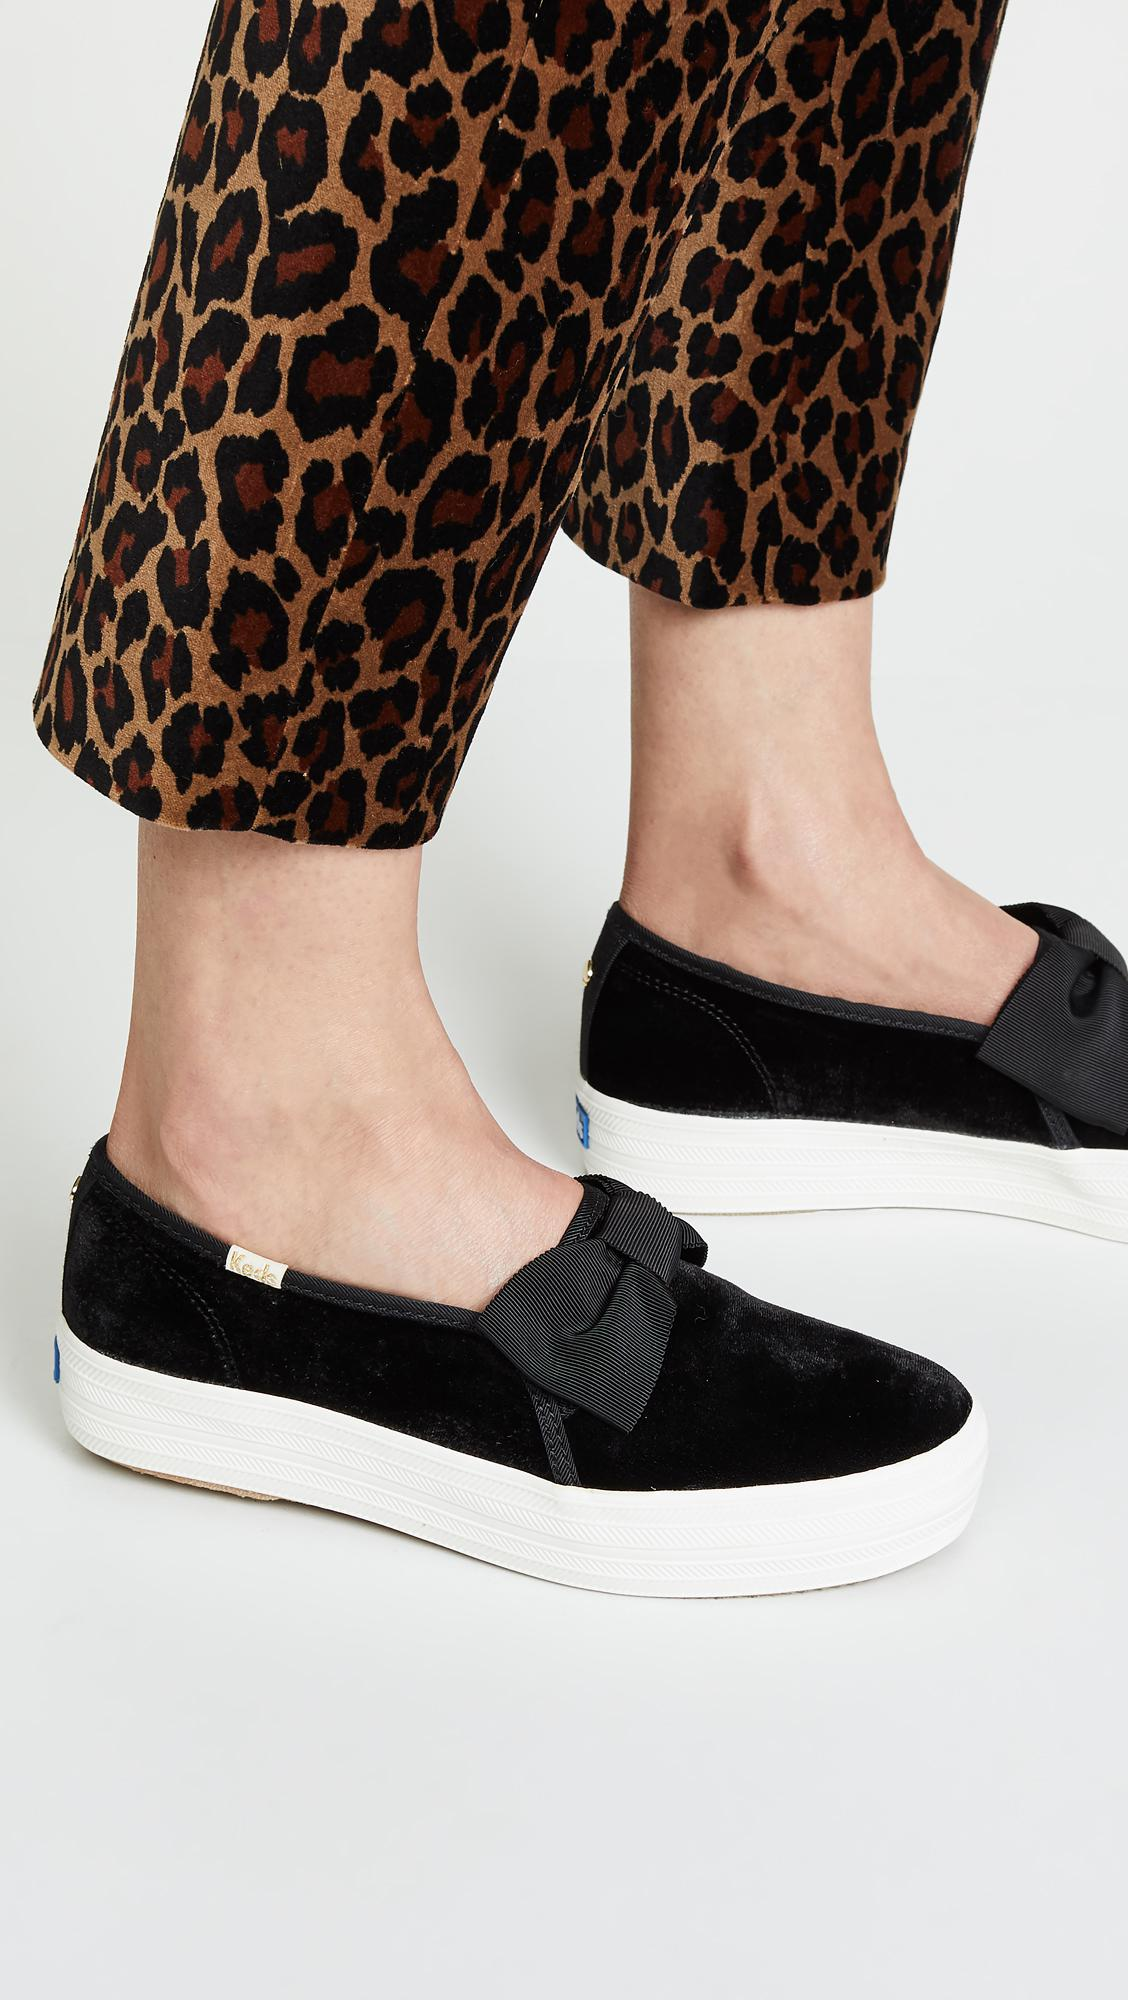 24738d71b97c Keds X Kate Spade New York Triple Decker Sneakers in Black - Lyst